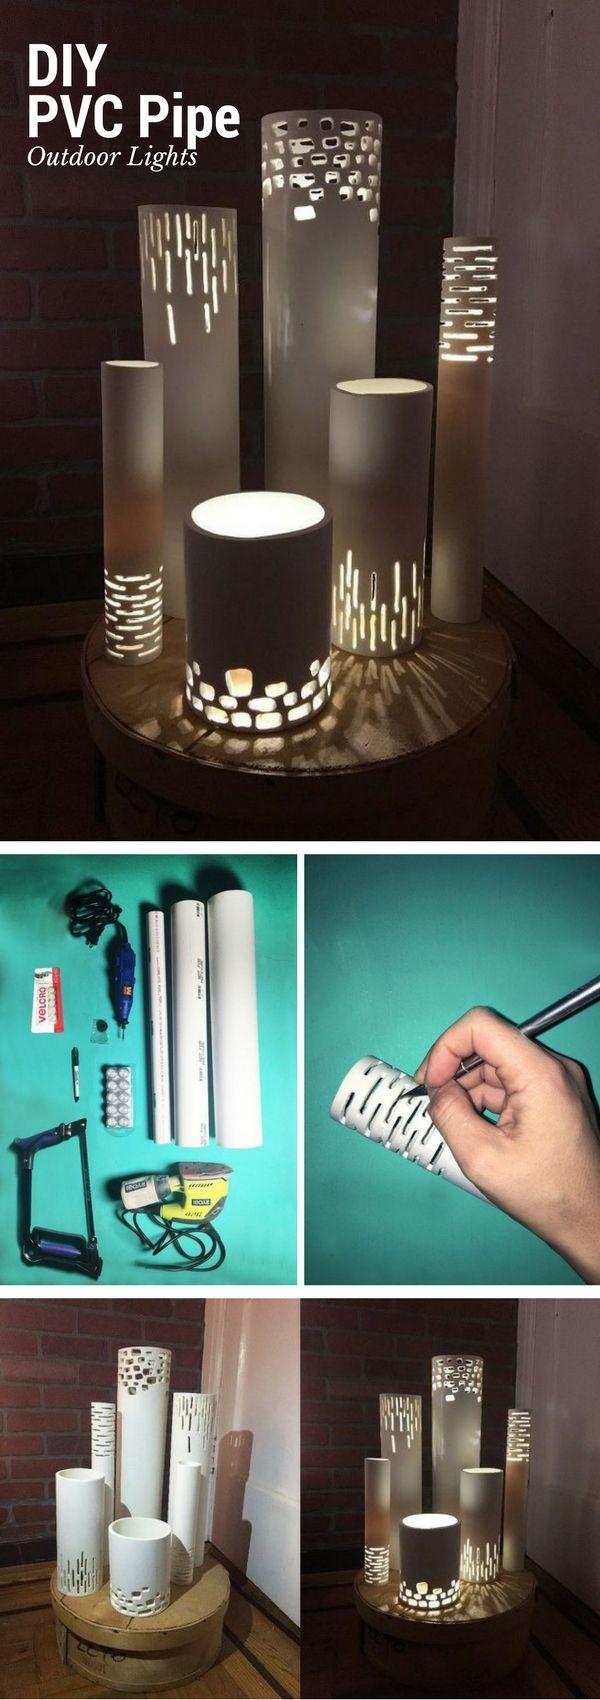 15 easy and creative diy outdoor lighting ideas pvc pipe pipes 15 easy and creative diy outdoor lighting ideas solutioingenieria Image collections